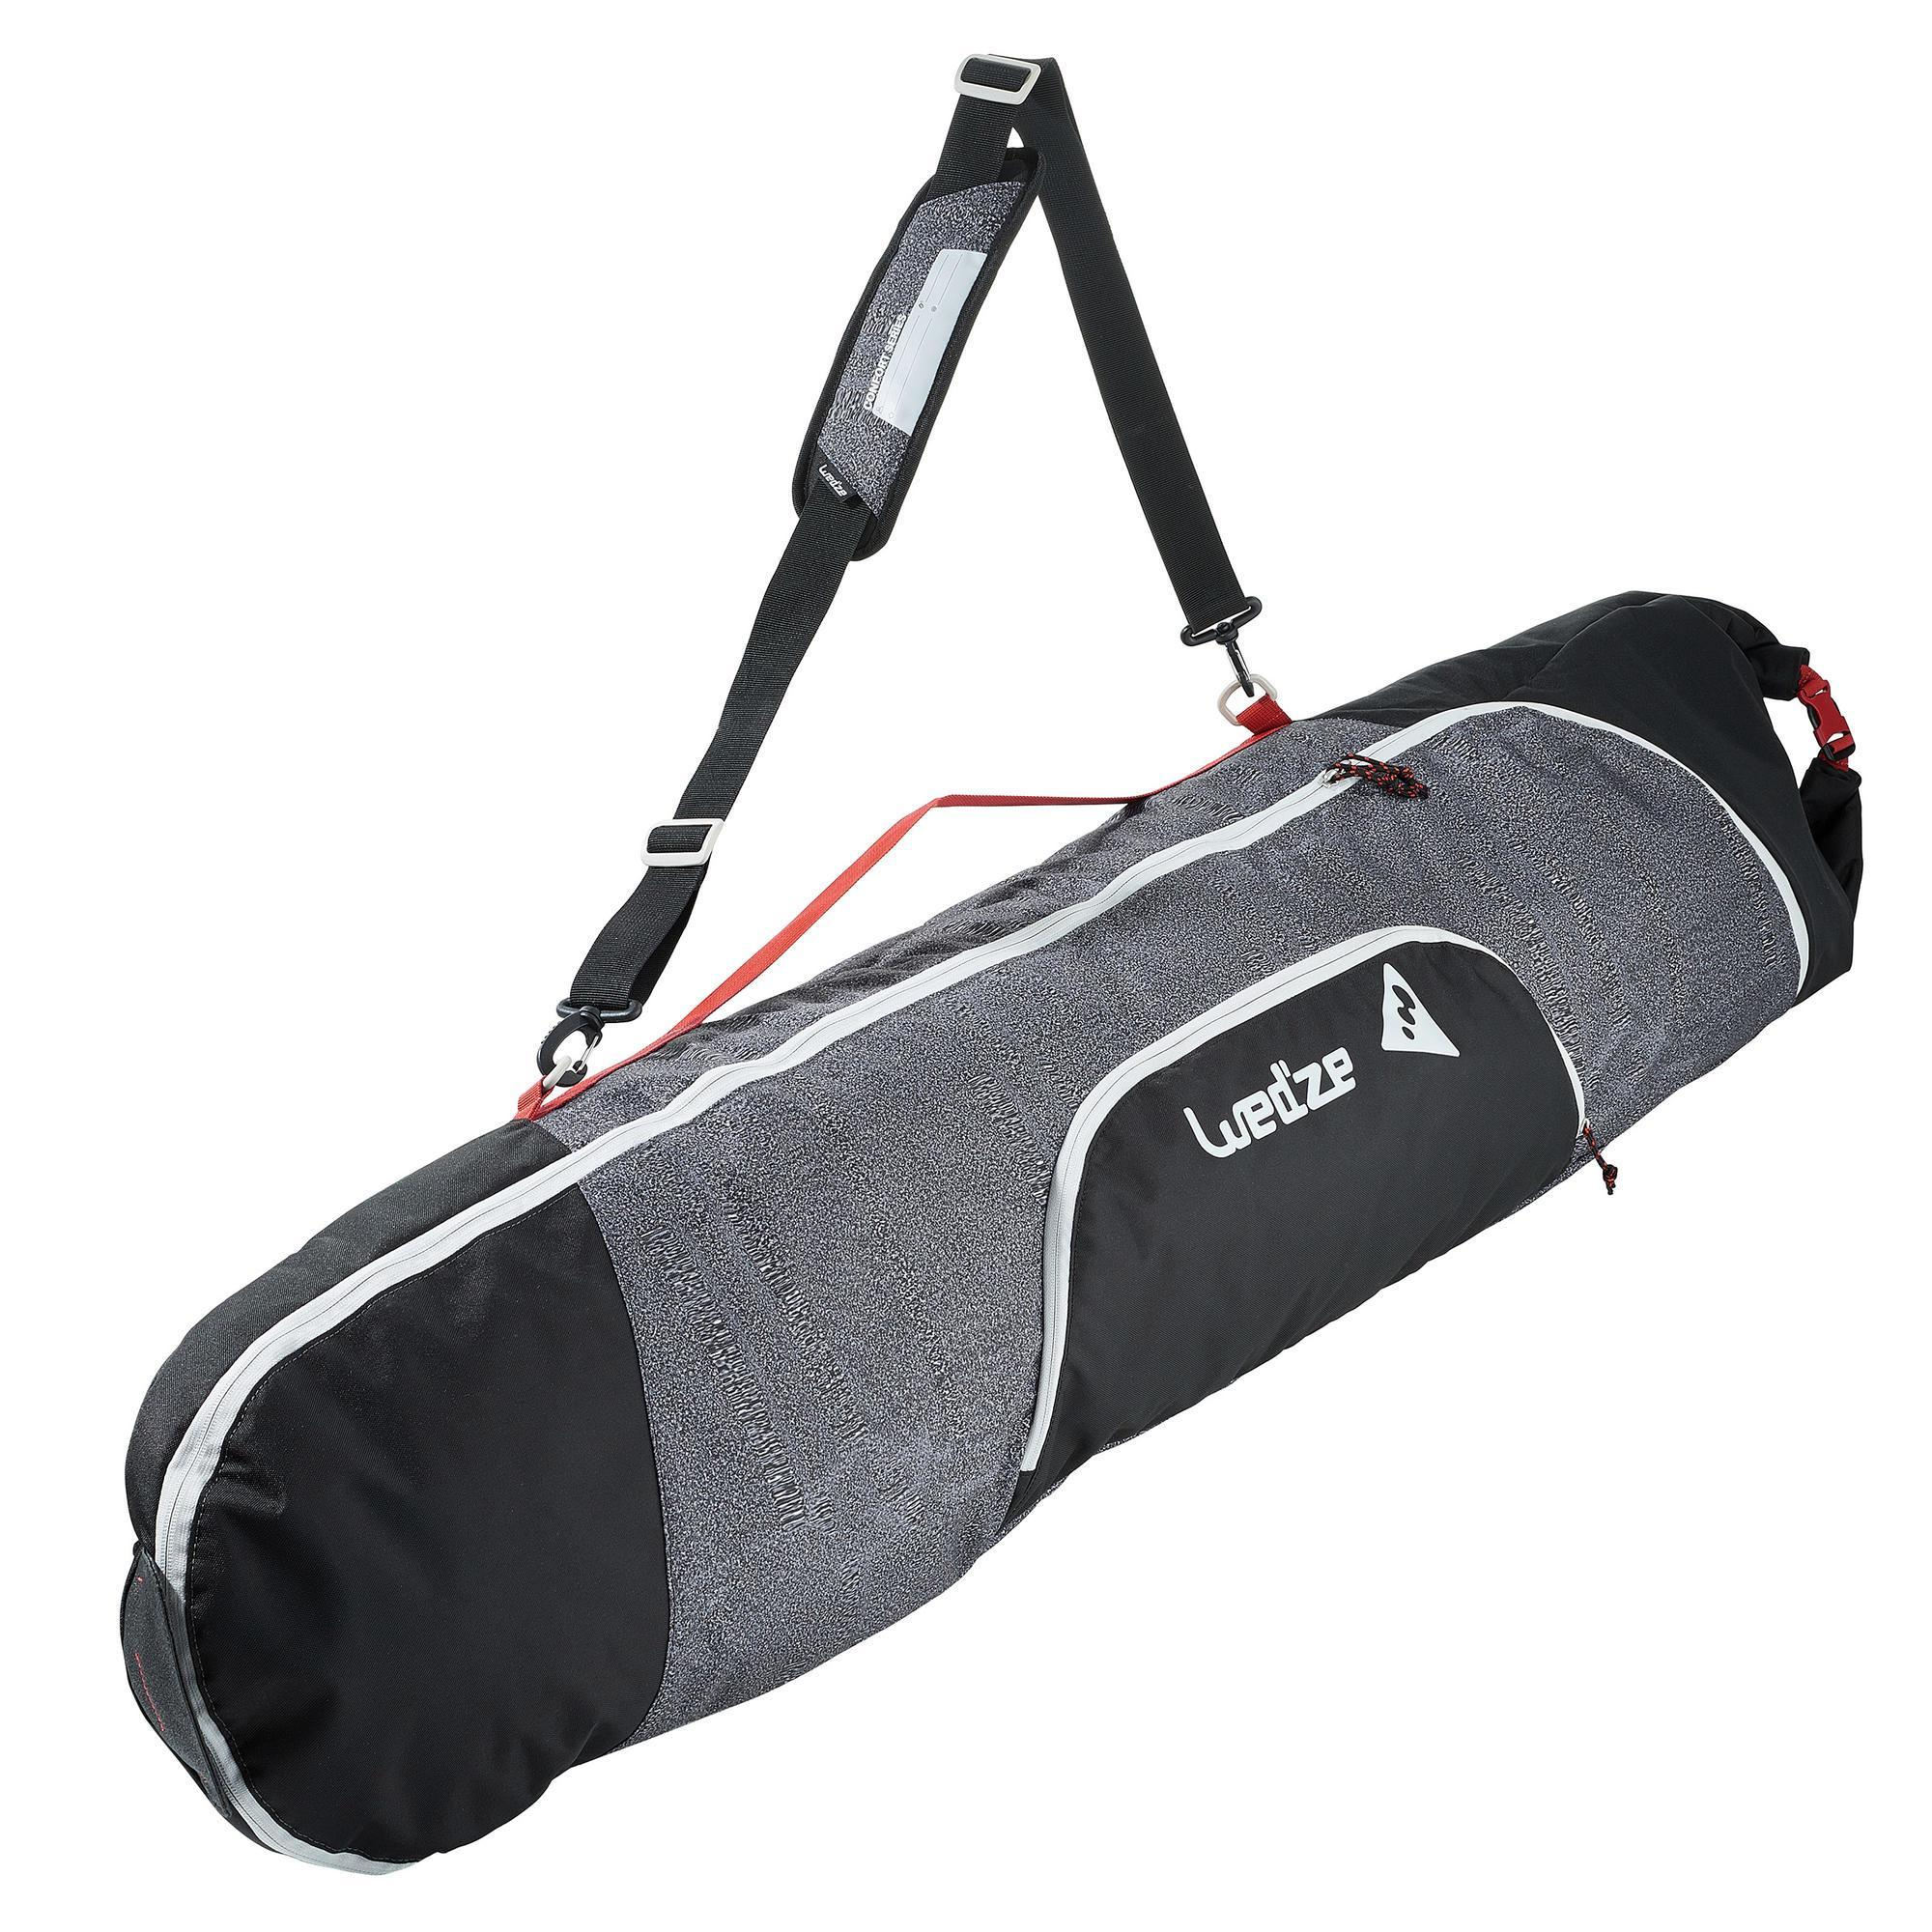 cafae026edcc6 Snowboardtasche Comfort 500 grau